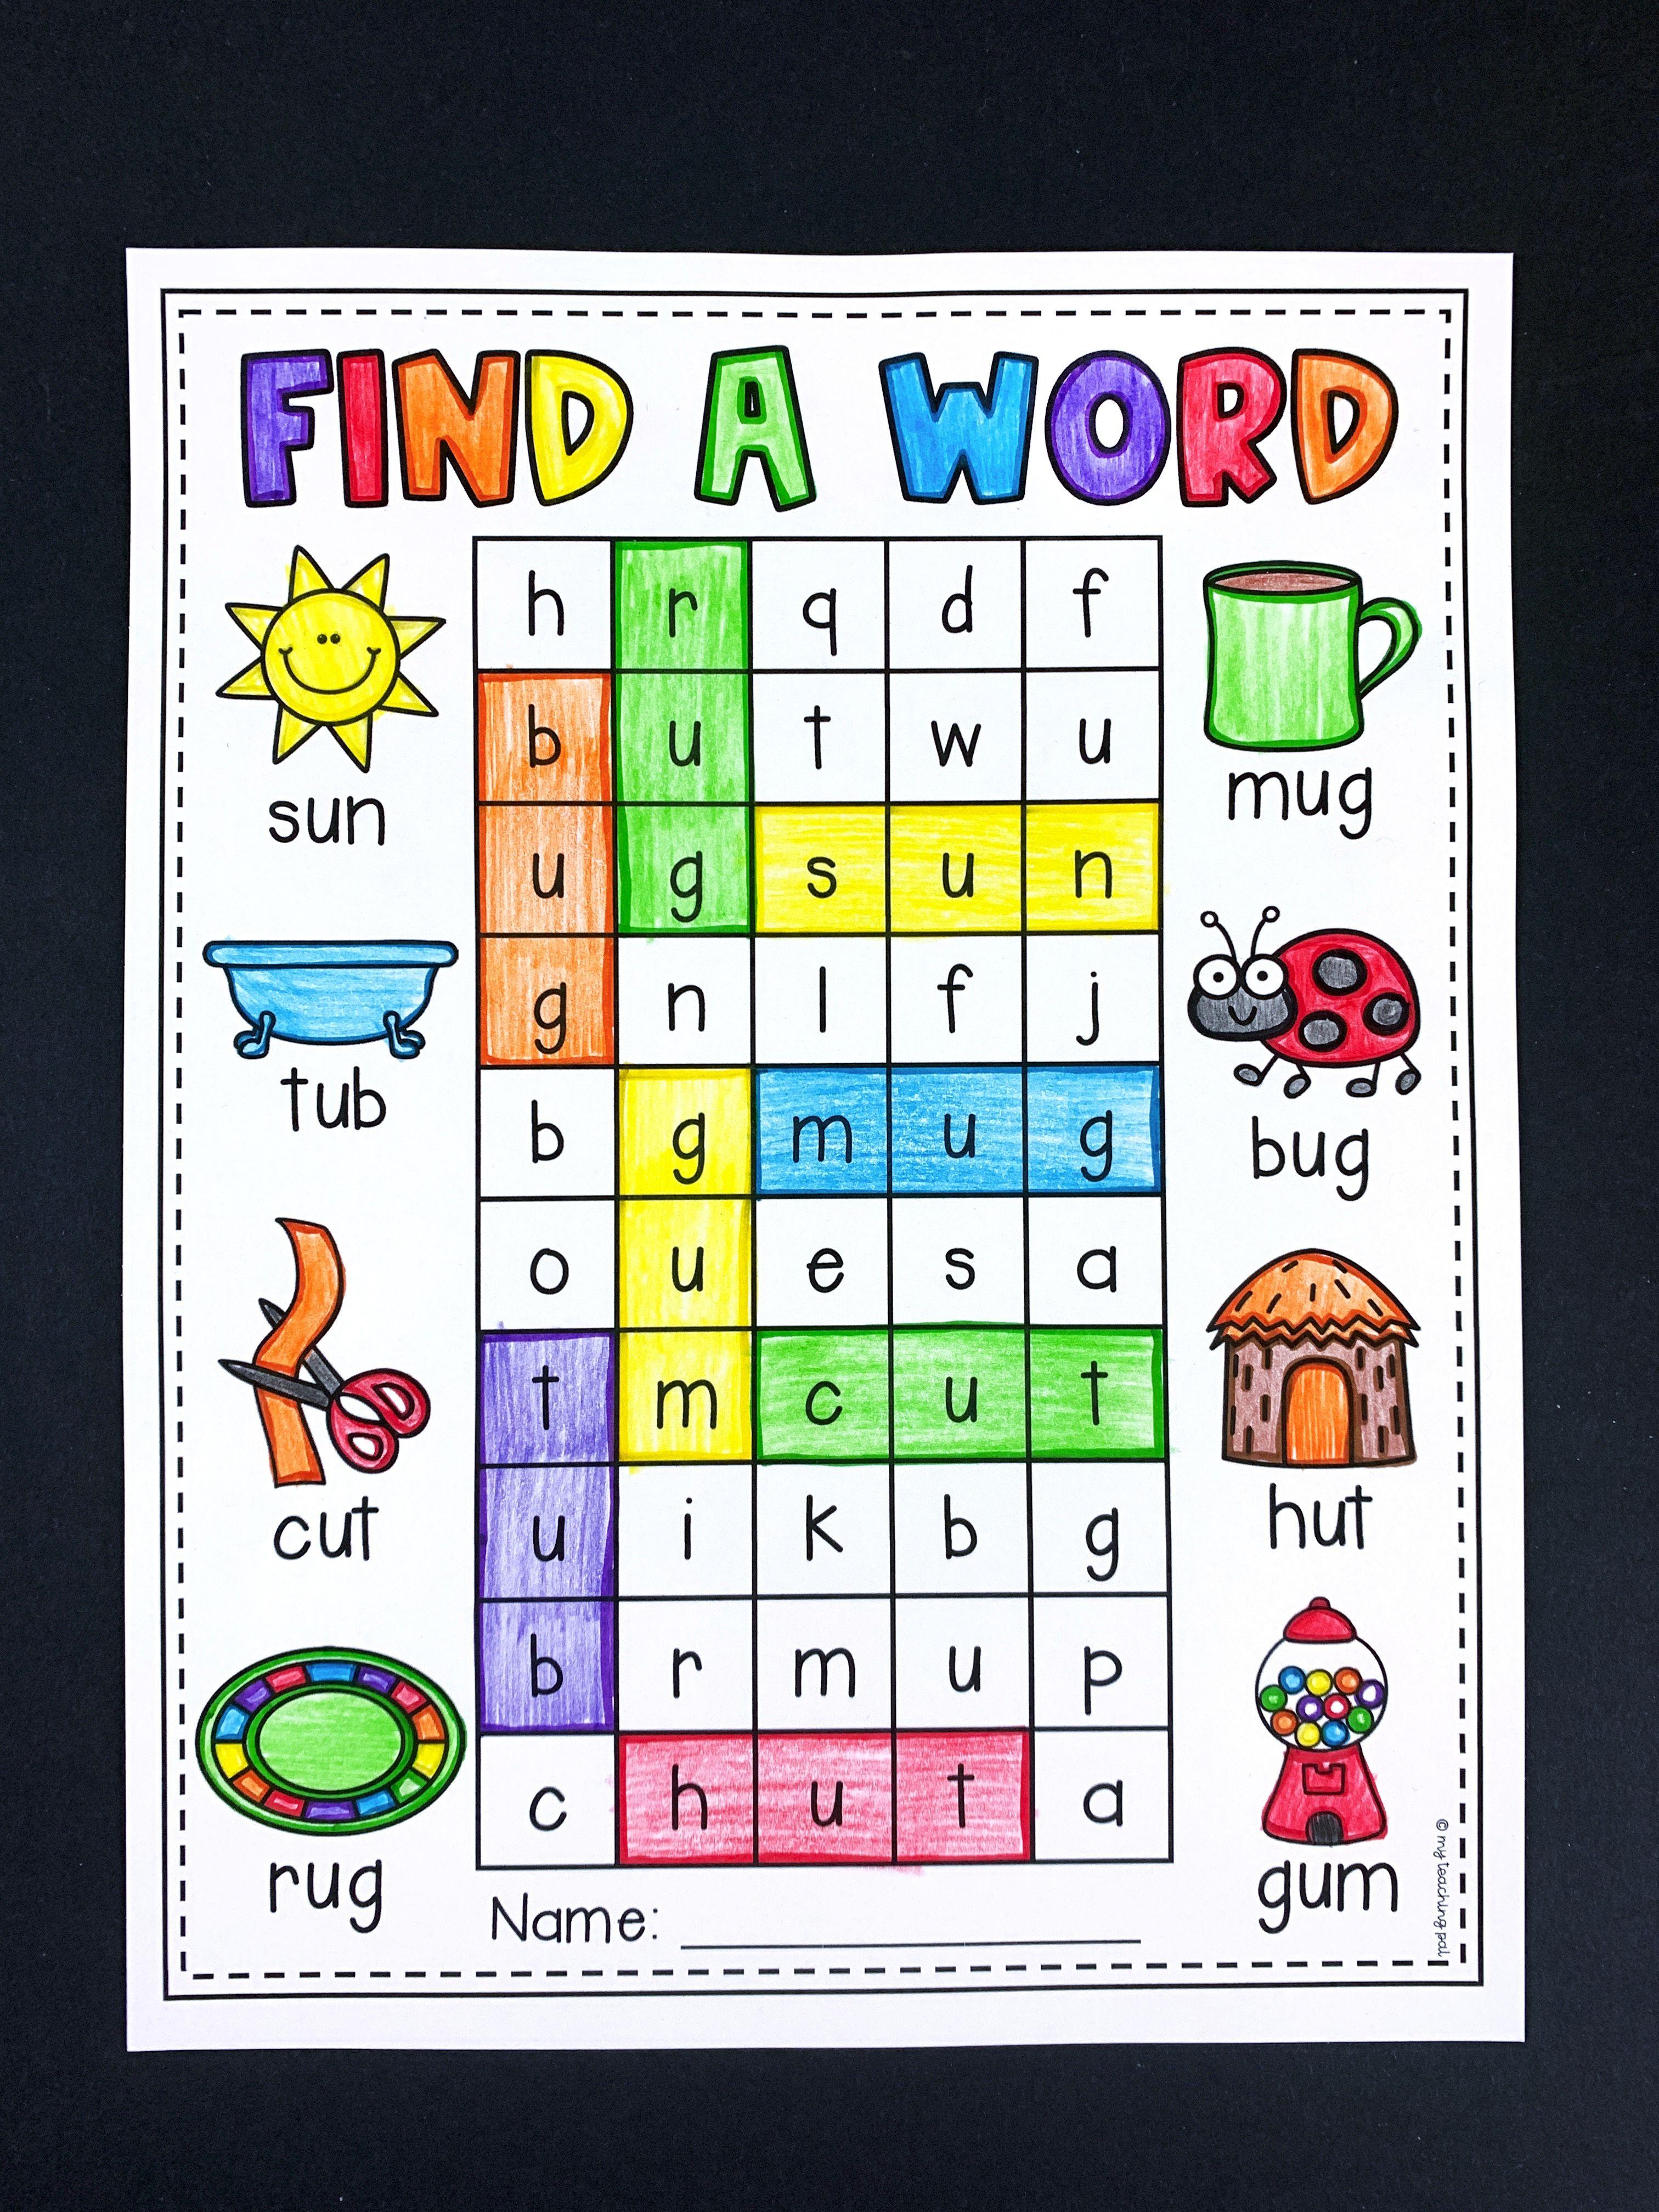 Find A Word Cvc Worksheets Math Activities Preschool Learning English For Kids Cvc Activities [ 4032 x 3024 Pixel ]